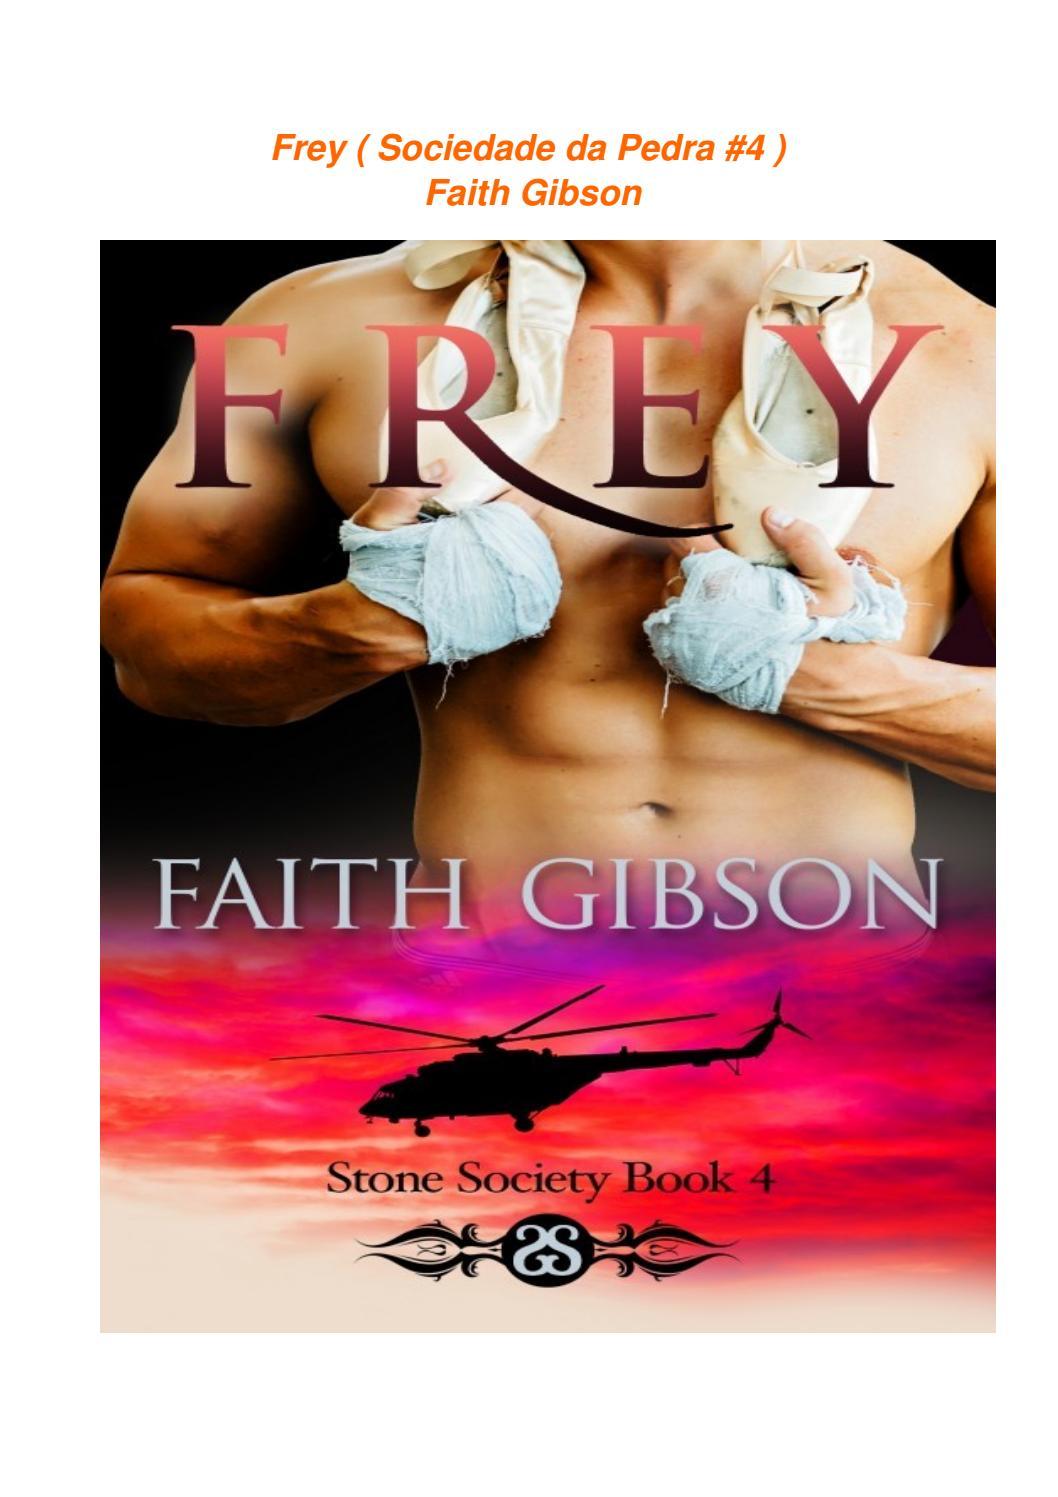 f19f00534 Faith Gibson - Frey ( Stone Society  4 ) Sociedade de Pedra by Livros    Chocolate - issuu